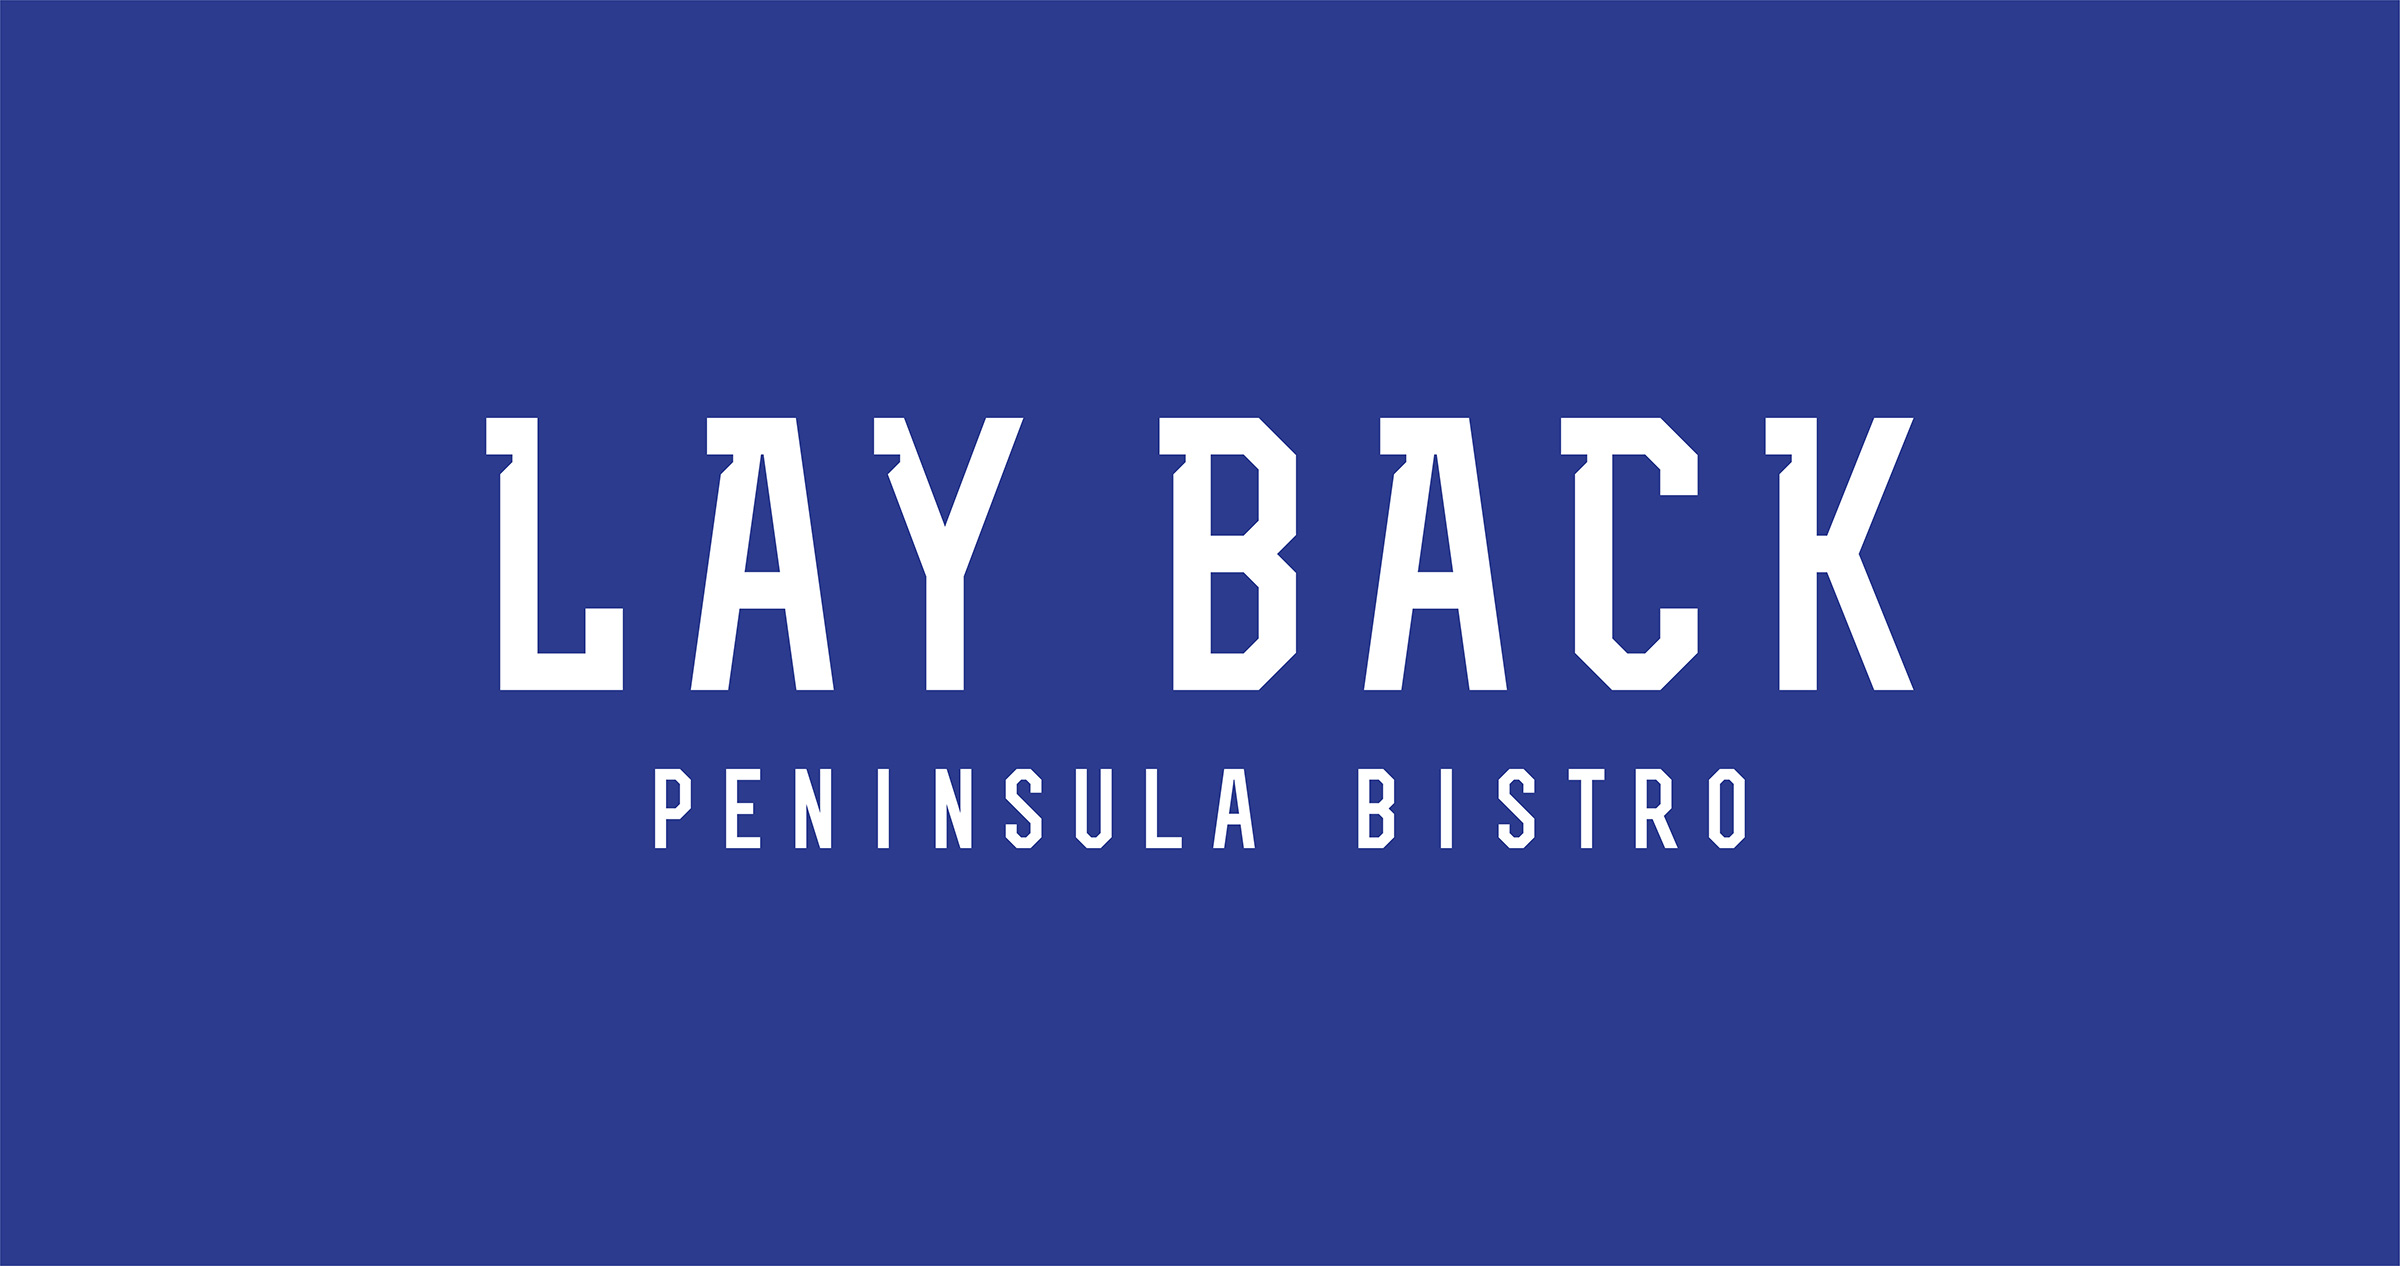 dankelab_layback_02